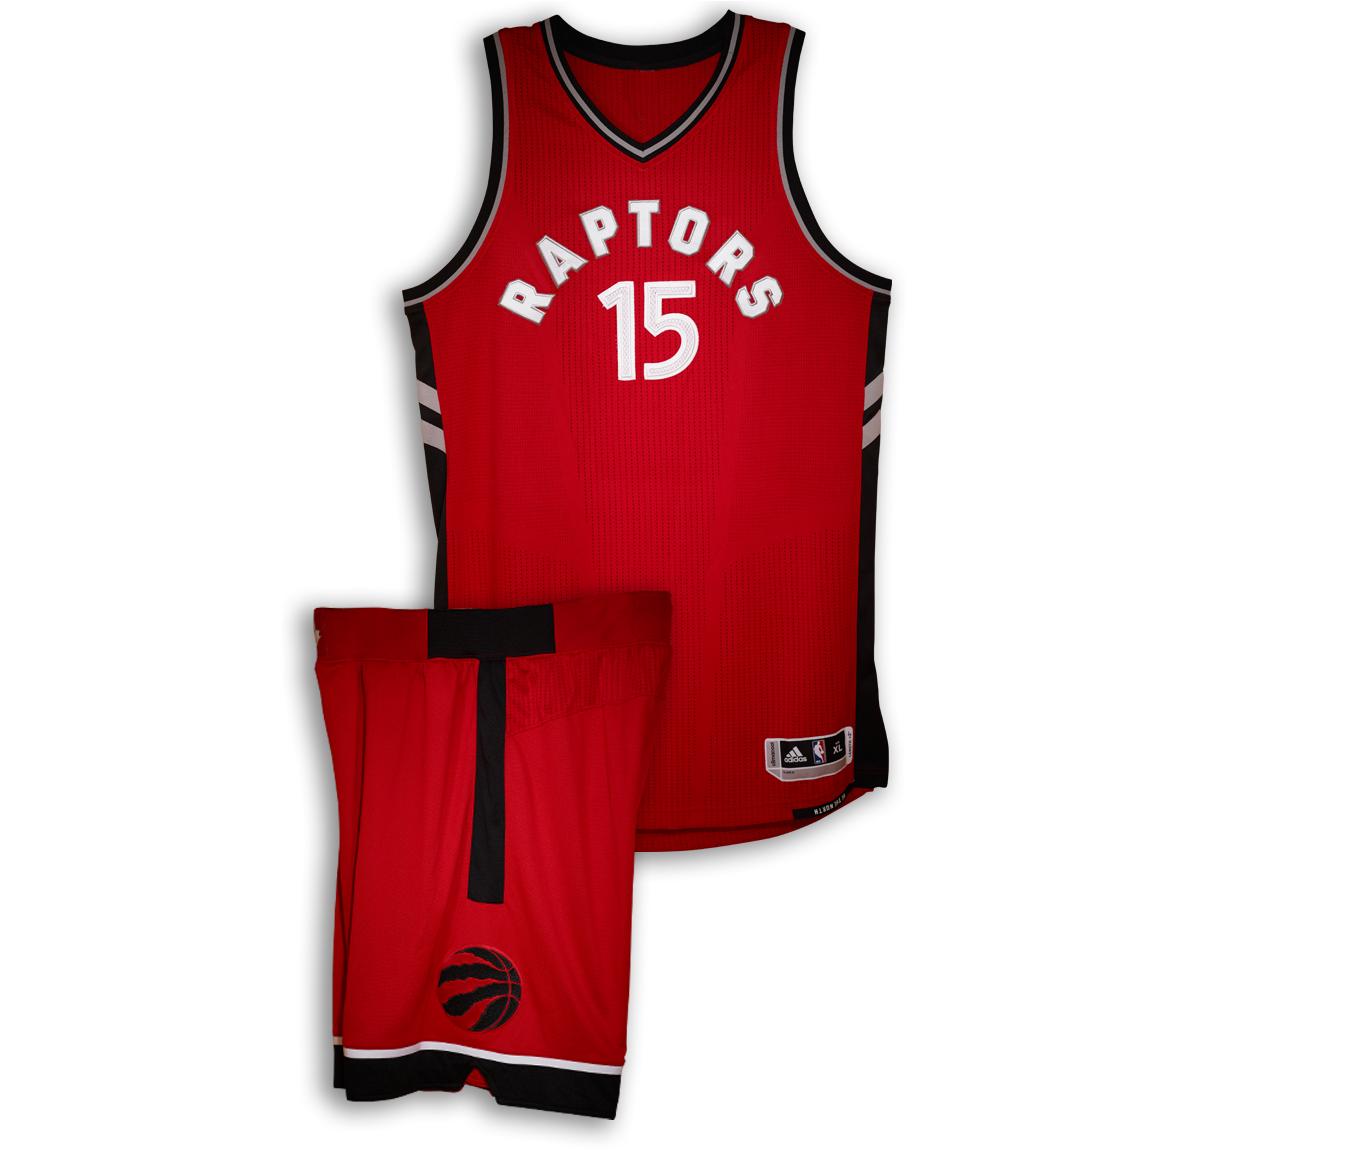 Toronto Raptors - Away uniform